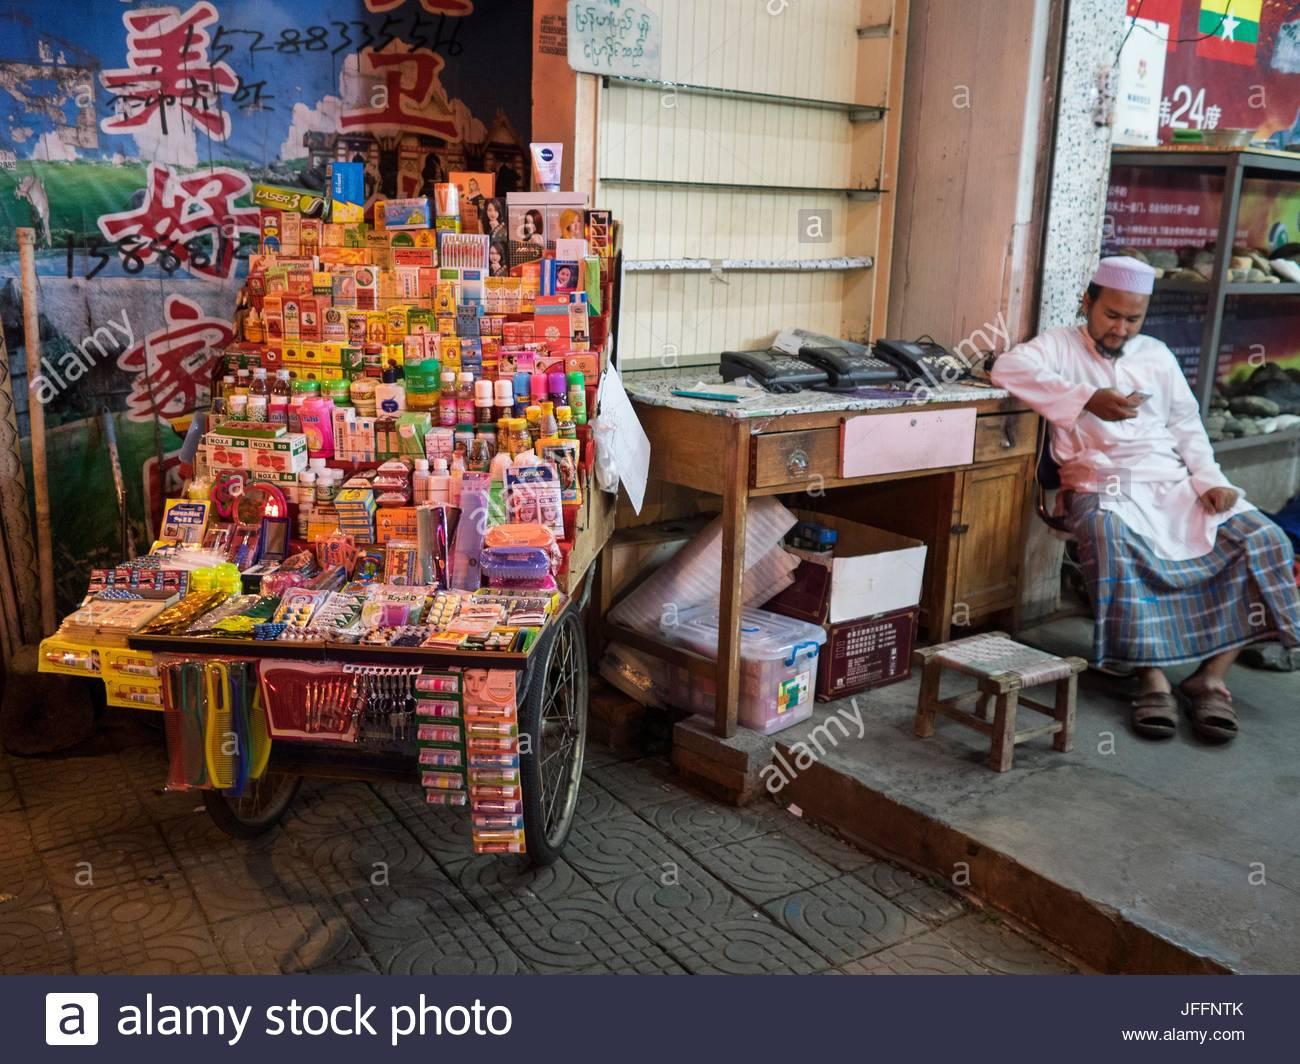 A street vendor checks his cell phone. - Stock Image